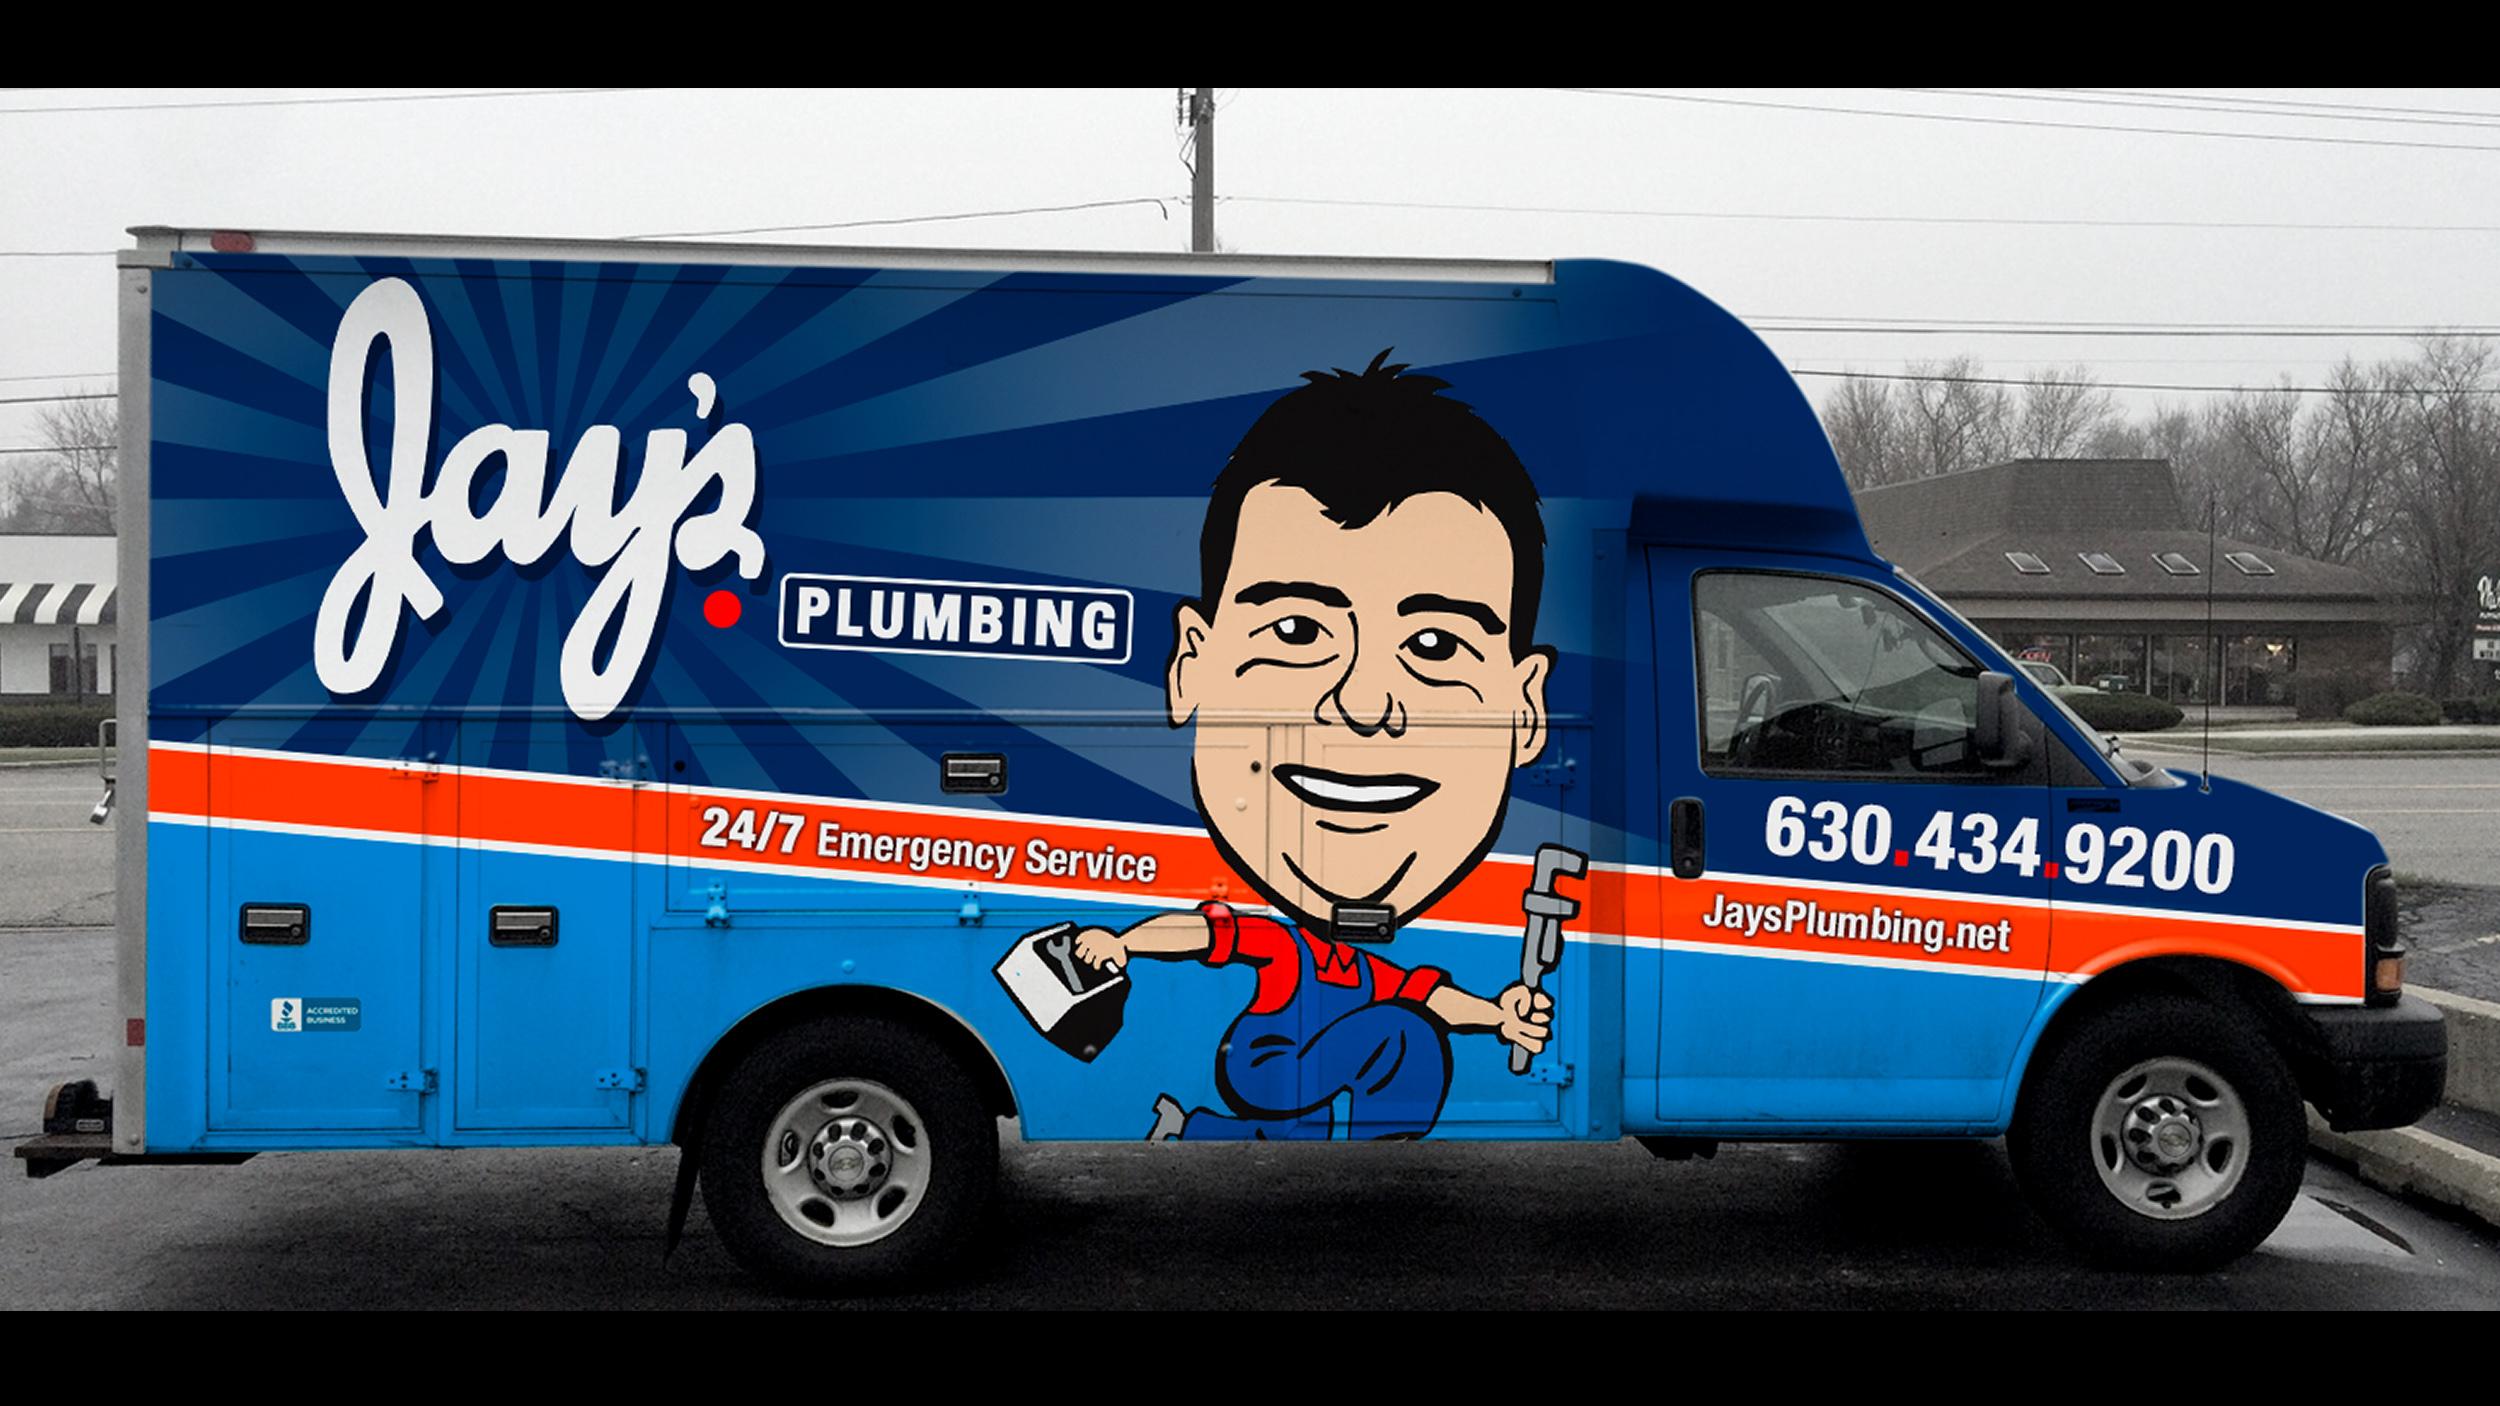 jays-plumbingEnvironmental-Large-Format-design.jpg